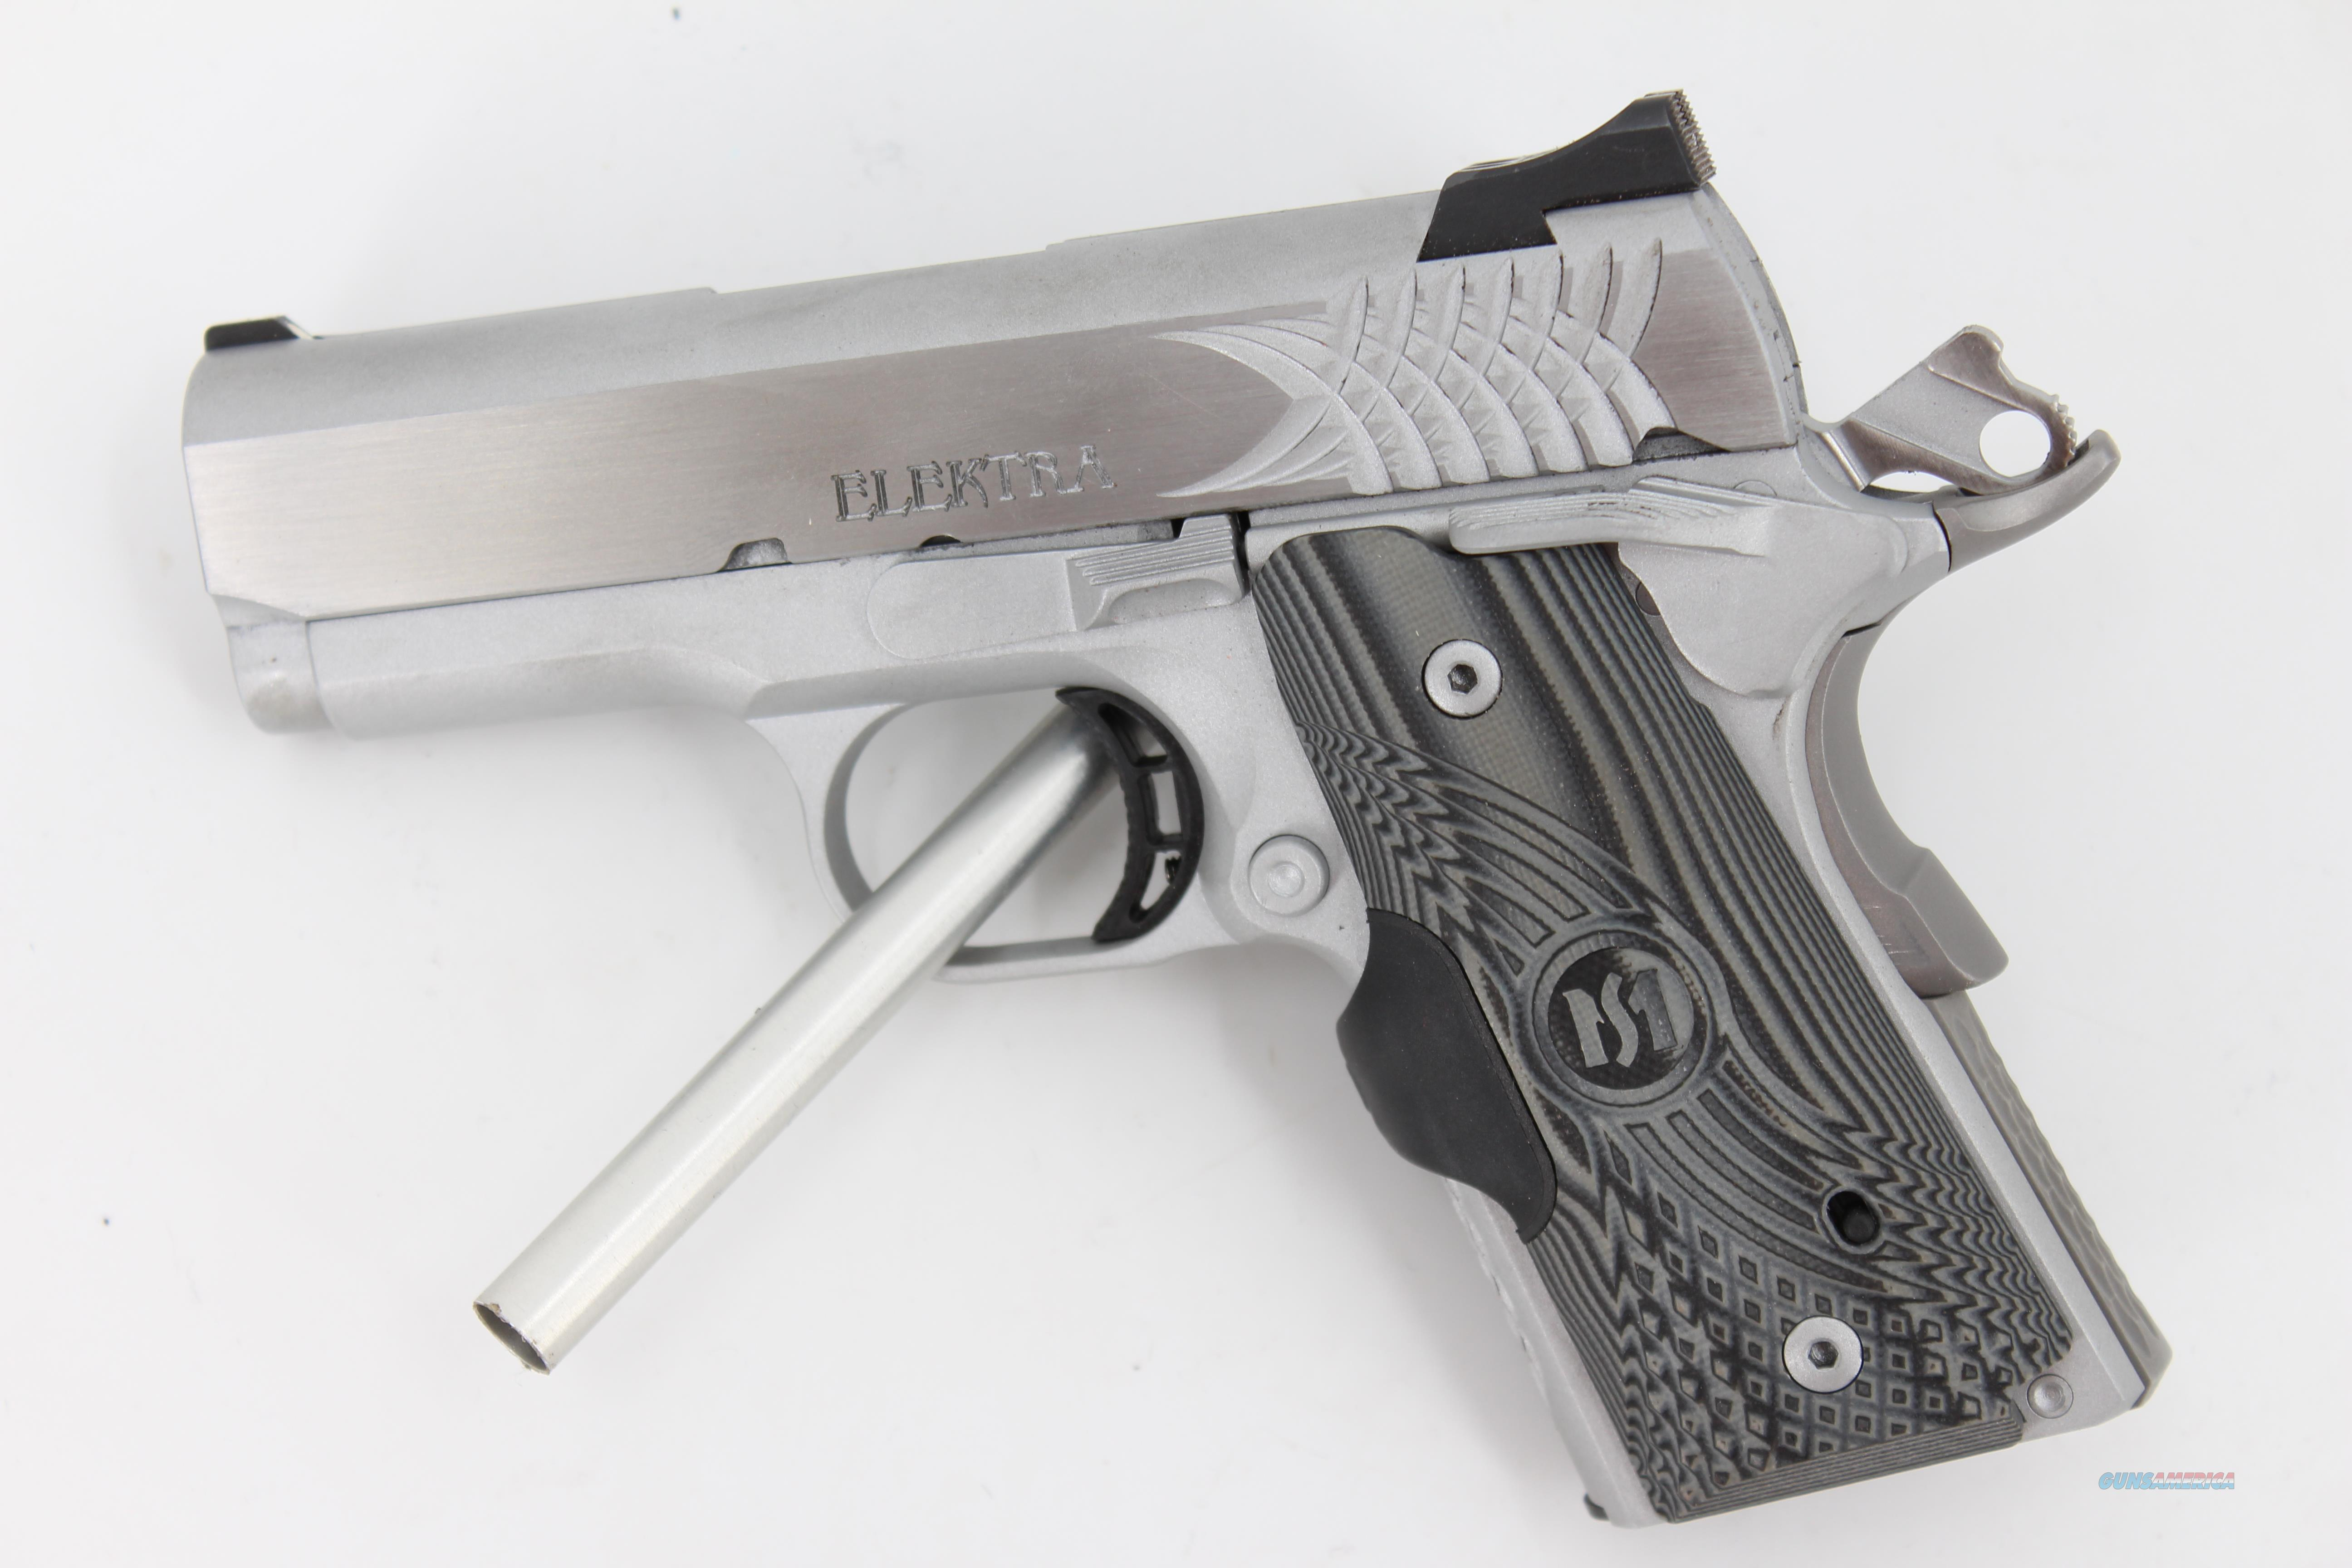 STI Elektra Stainless 9mm w/ Crimson Trace Grips  Guns > Pistols > STI Pistols